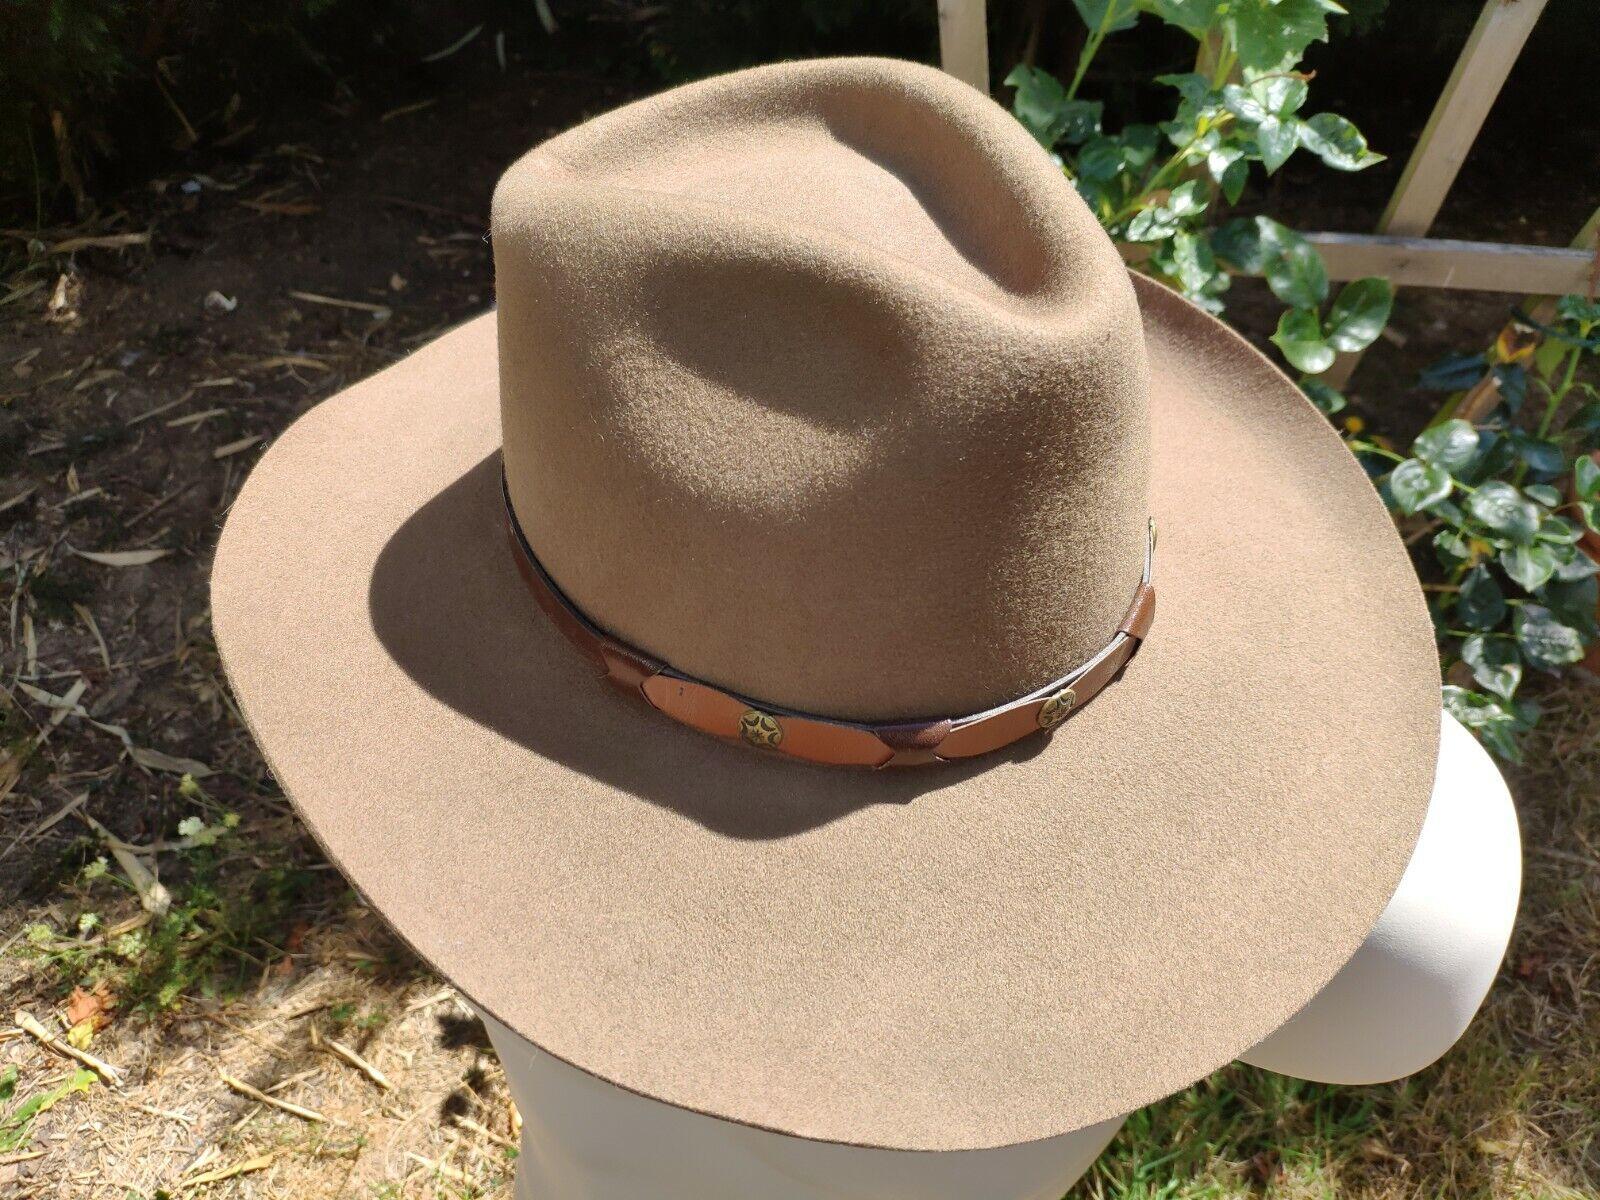 Chapeau bailey xx wool blend mackey size 60/61